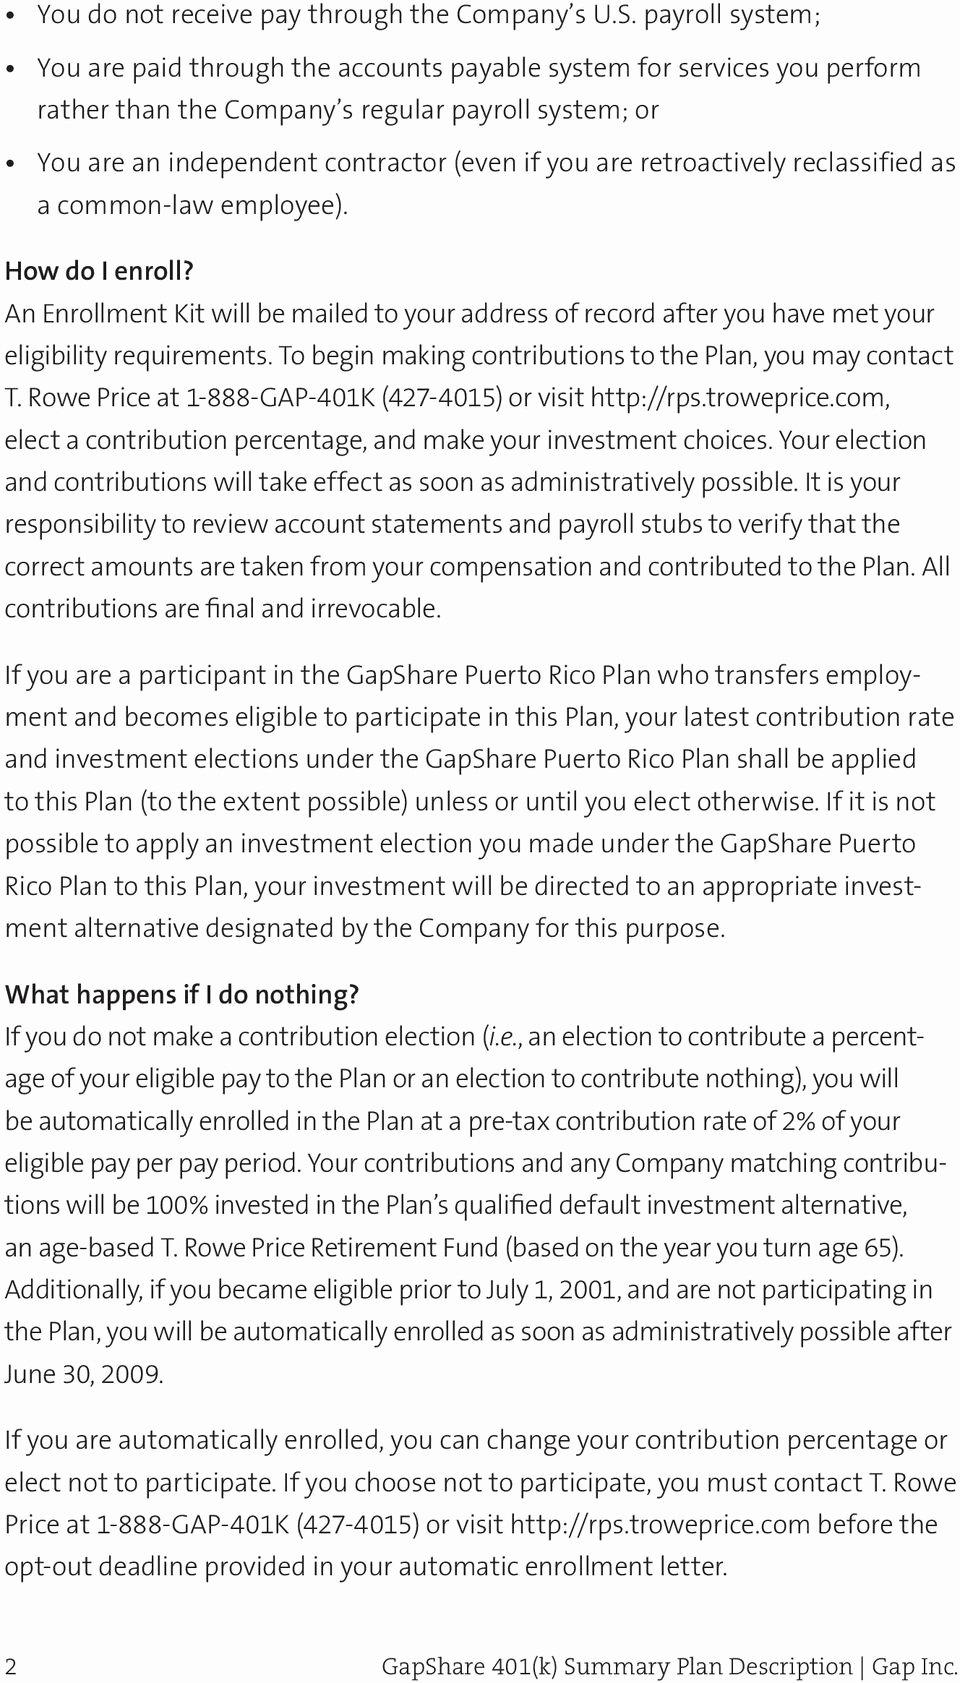 Sample Open Enrollment Letter to Employees Lovely 401k Employee Enrollment Letter